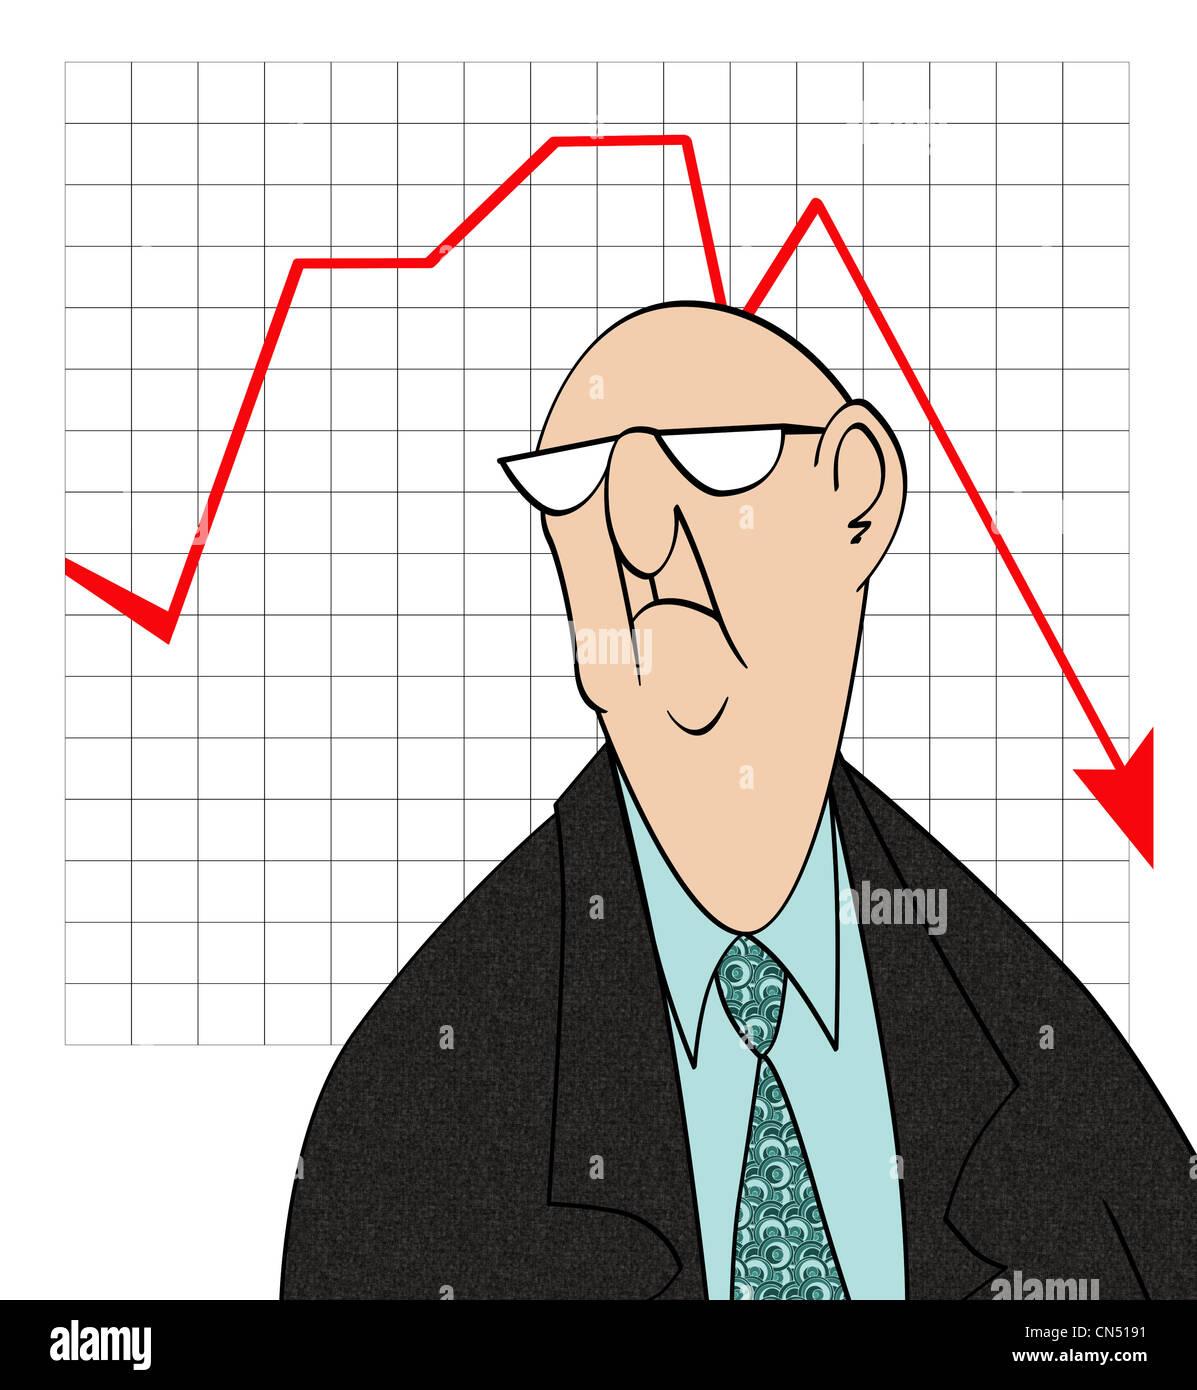 Bad Sales Chart Stock Photo - Alamy